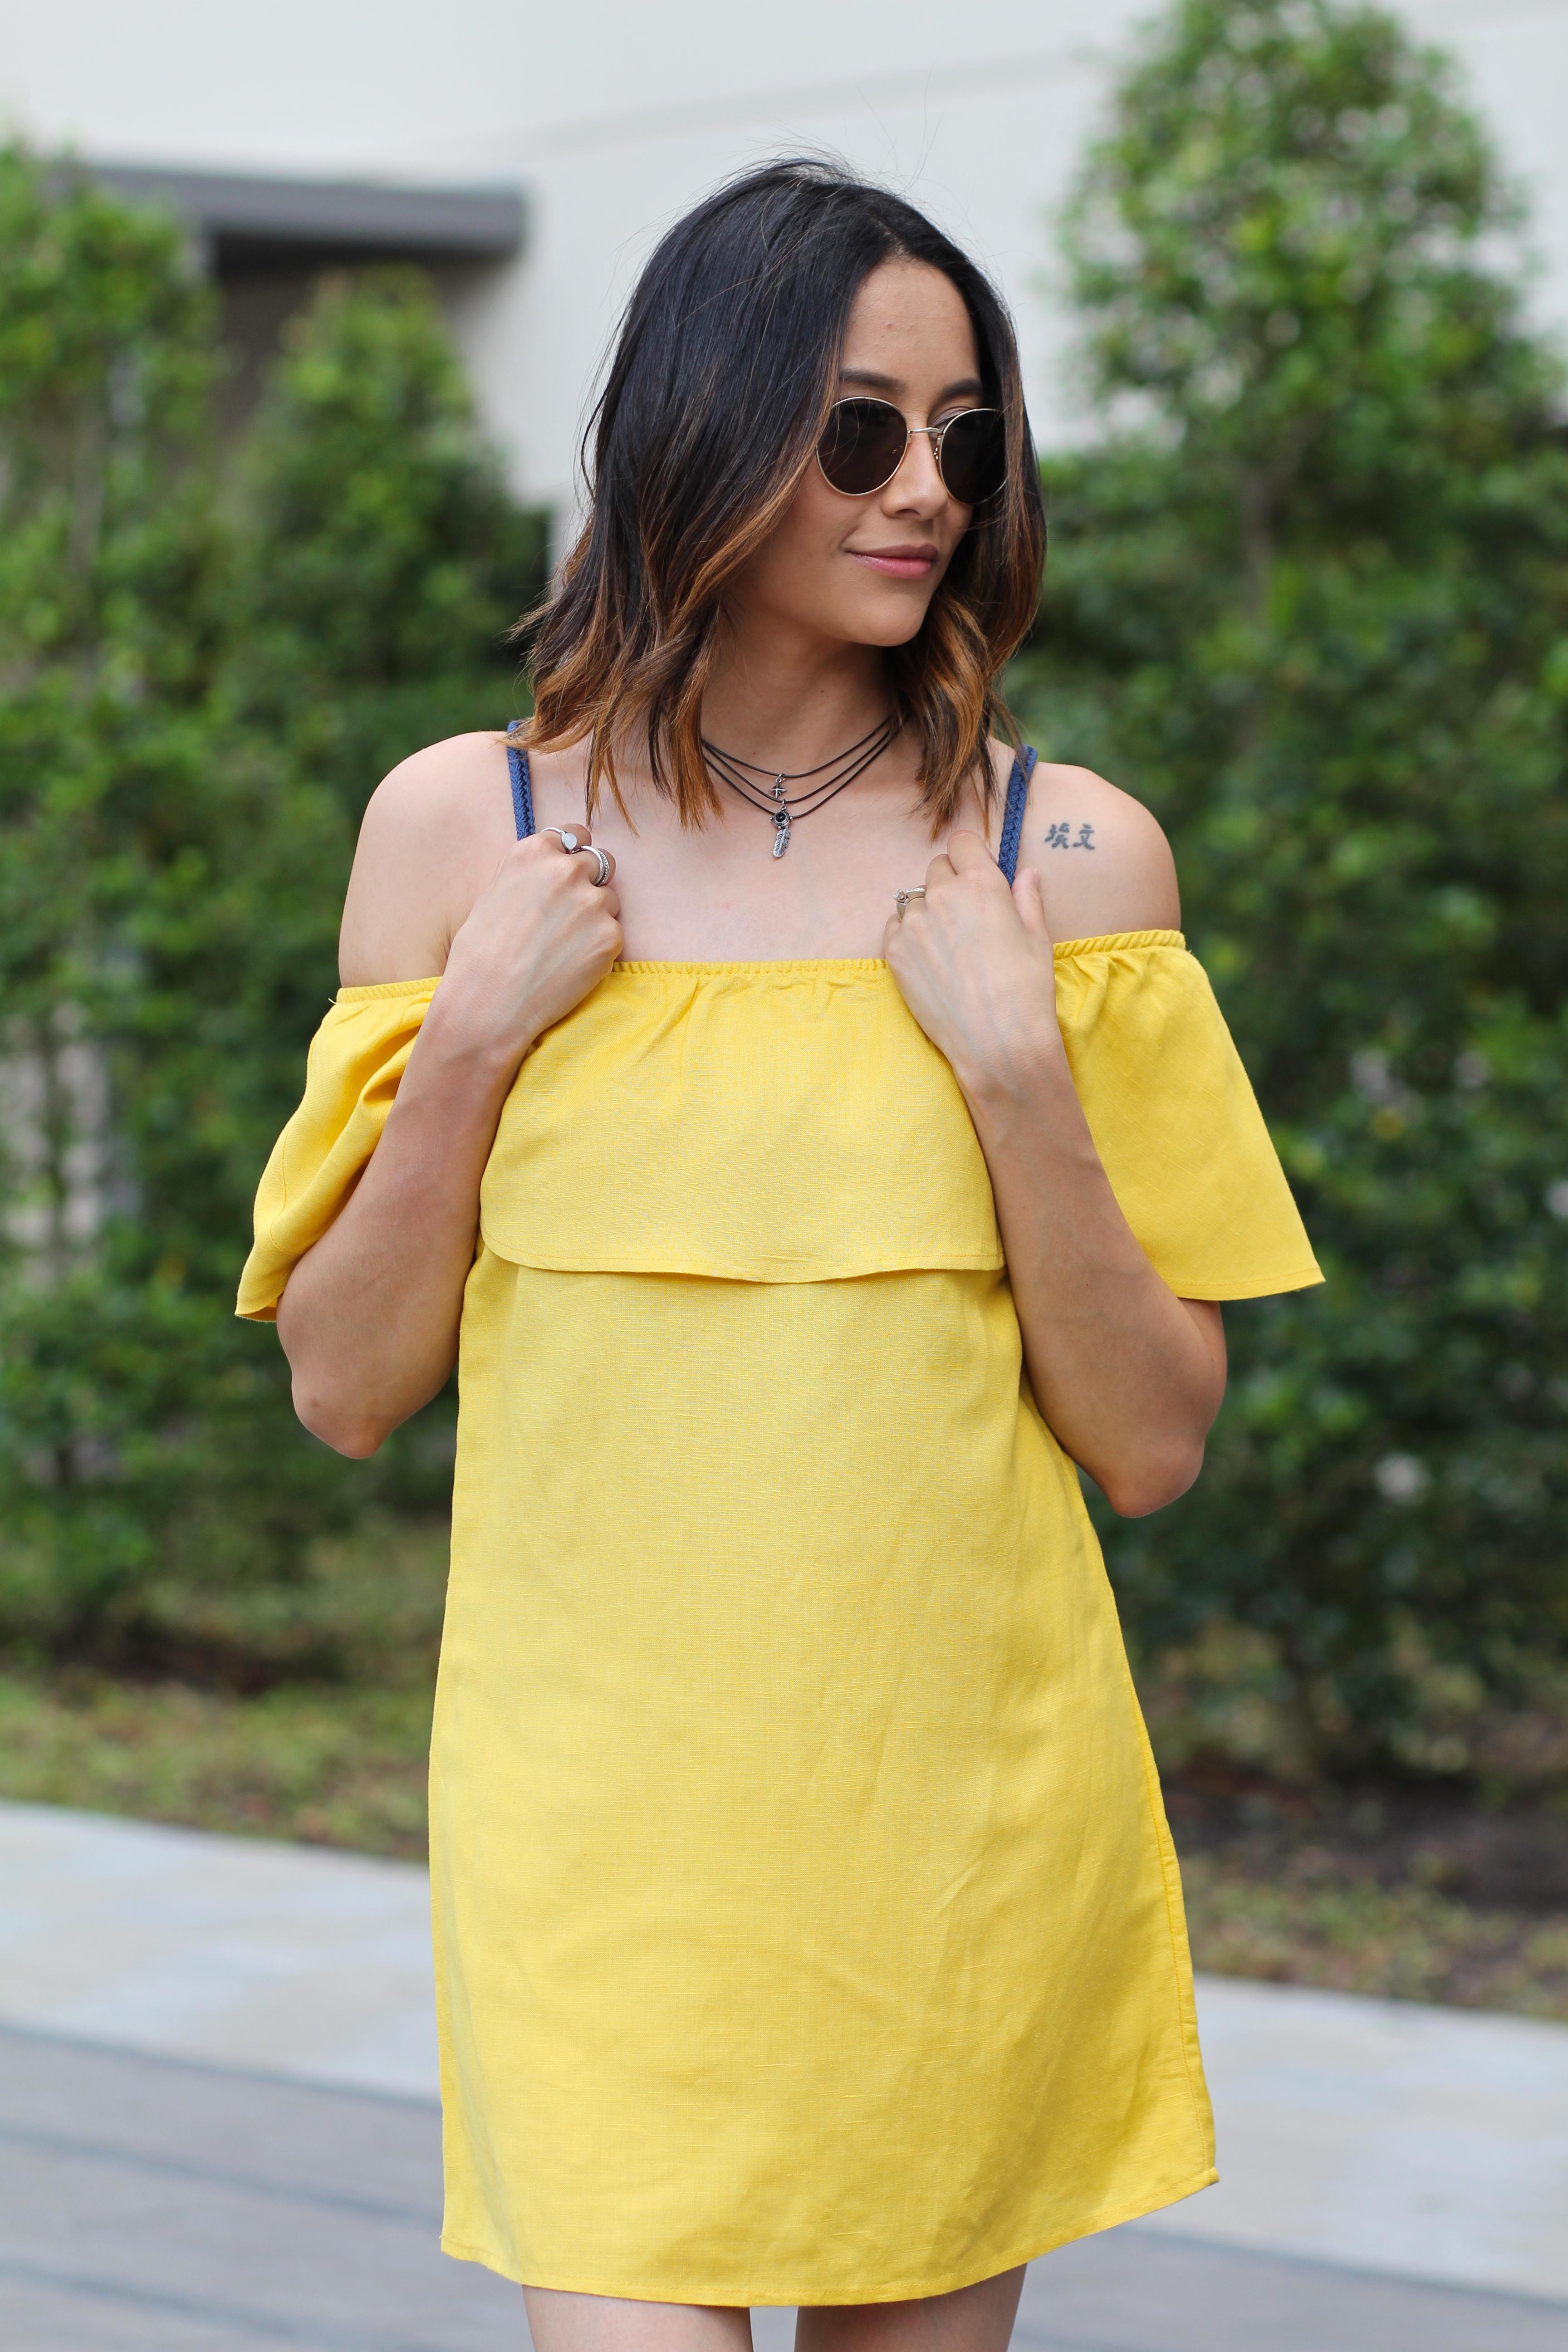 Sayulita Crocheted Backpack | Round Sunglasses | Off The Shoudler Dress